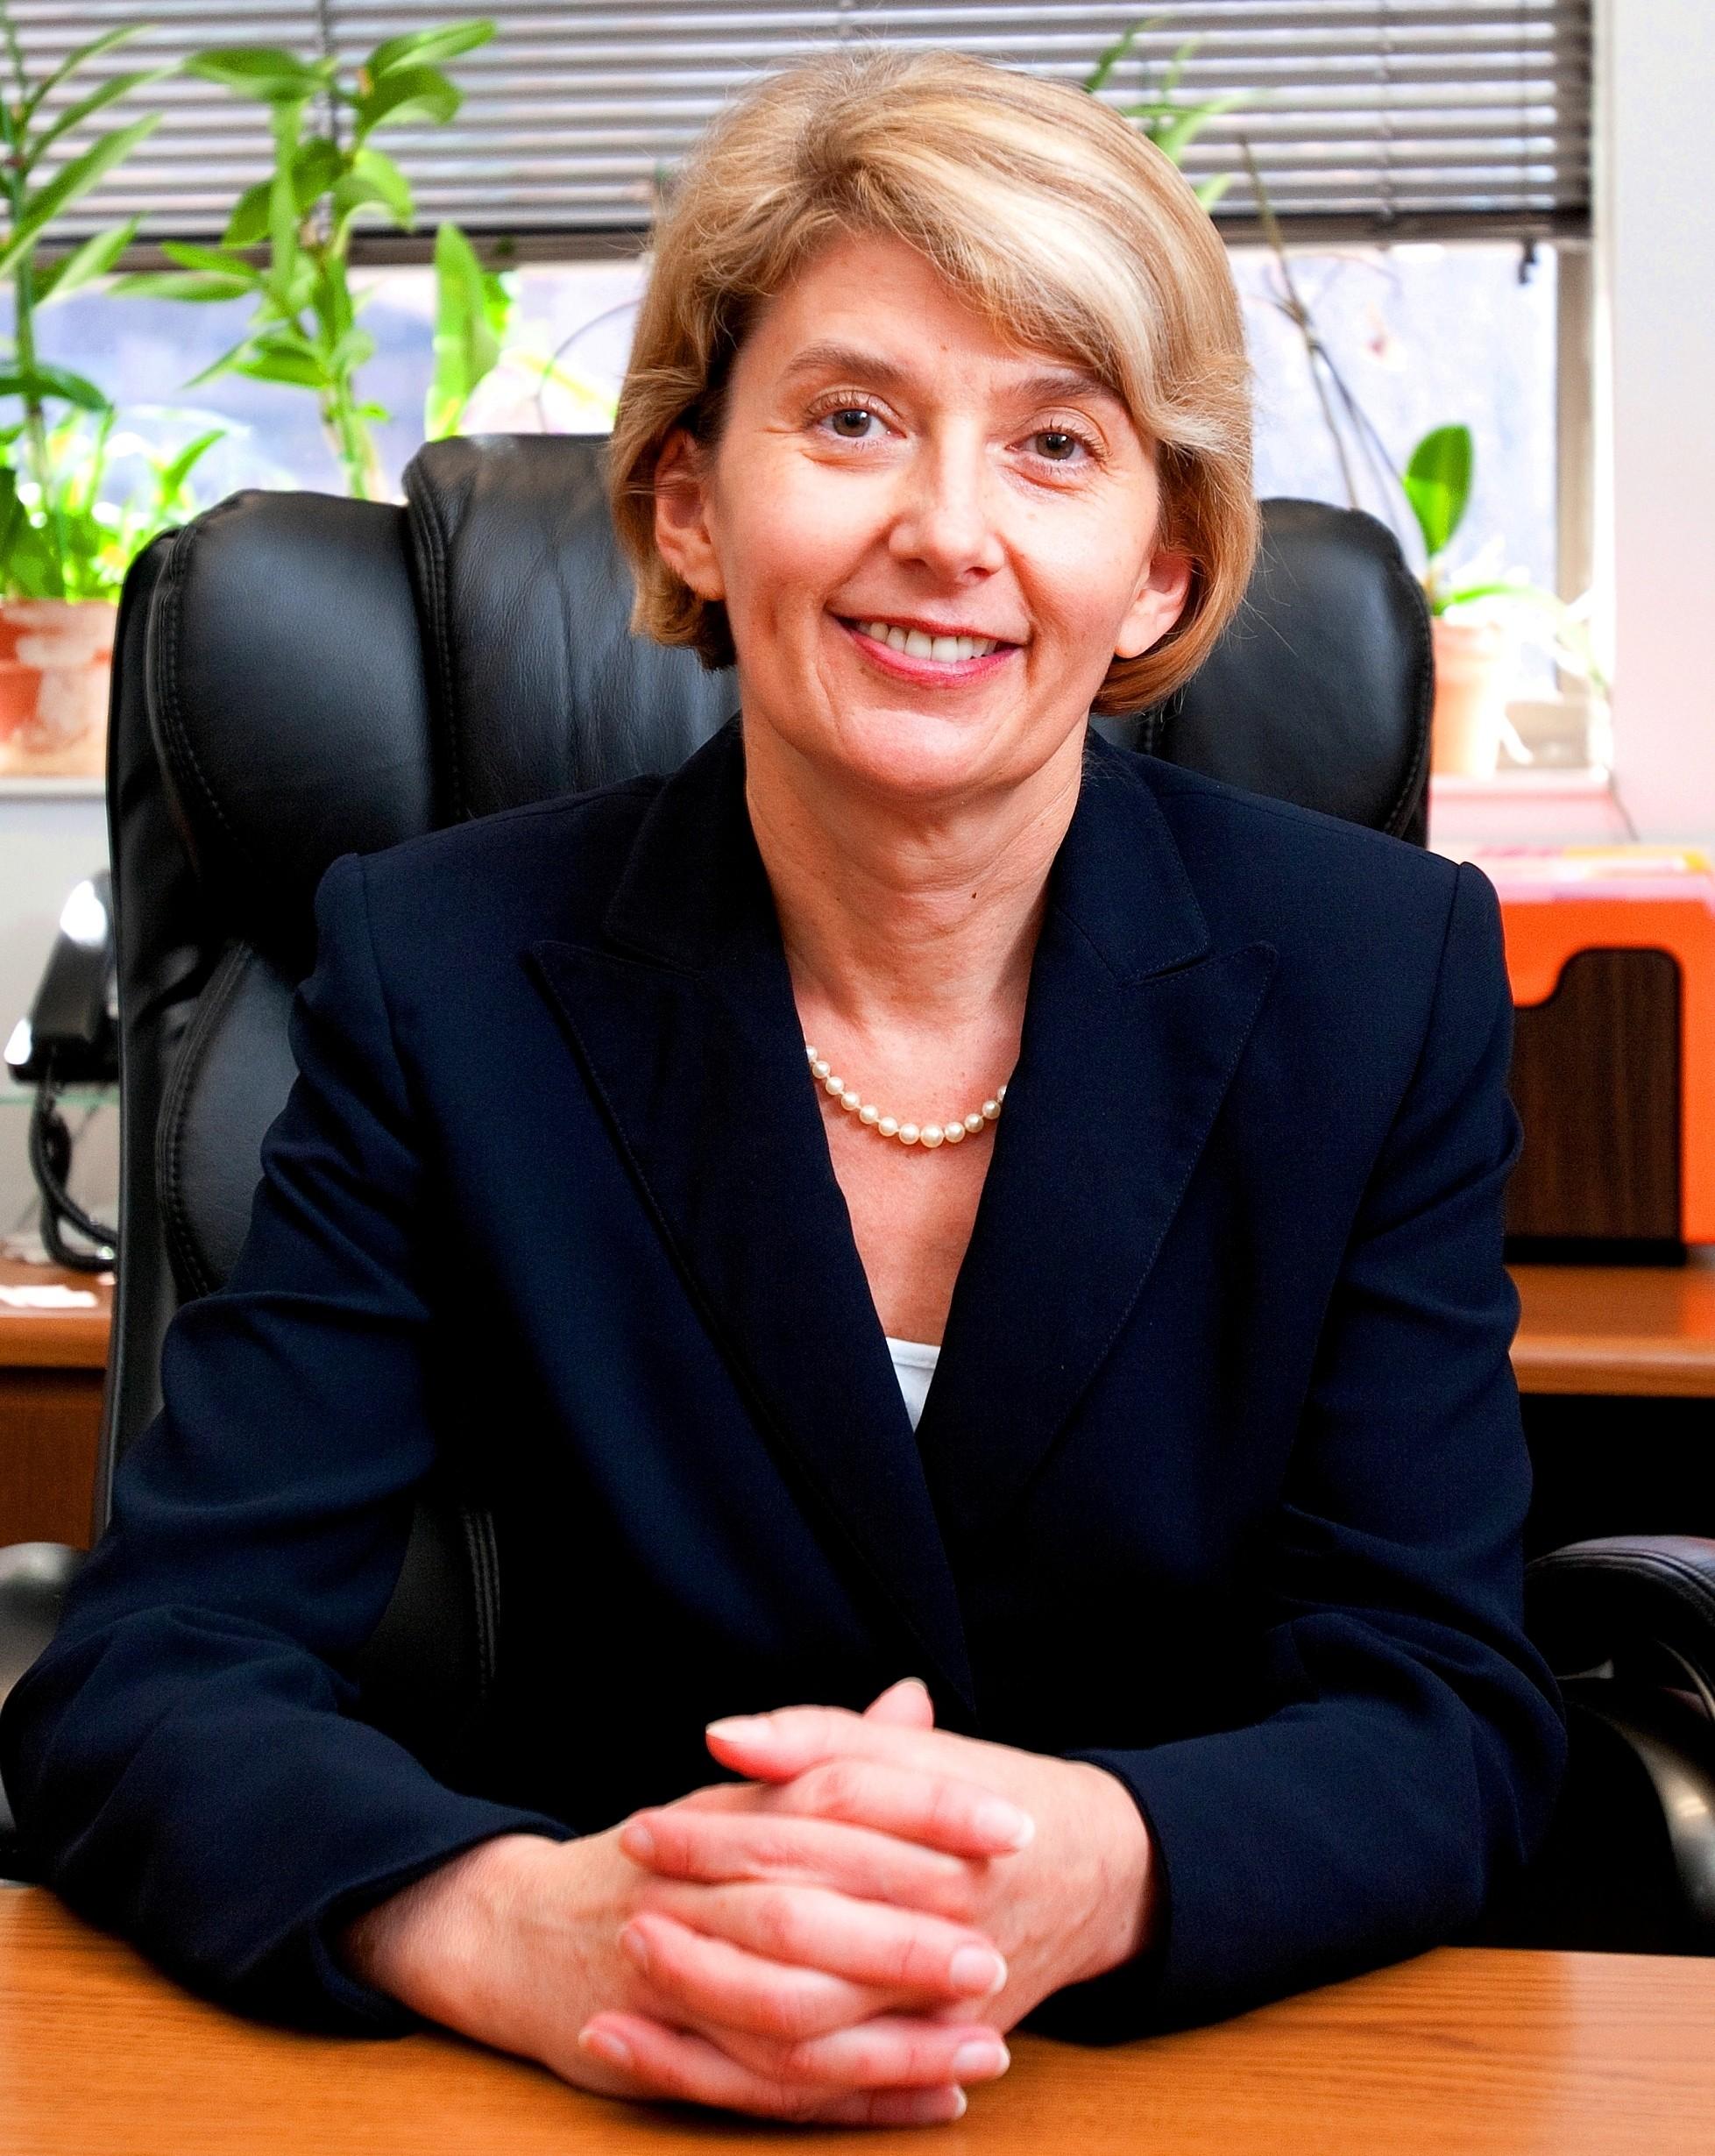 Lucia Notterpek, Ph.D. Chair and Professor Department of Neuroscience